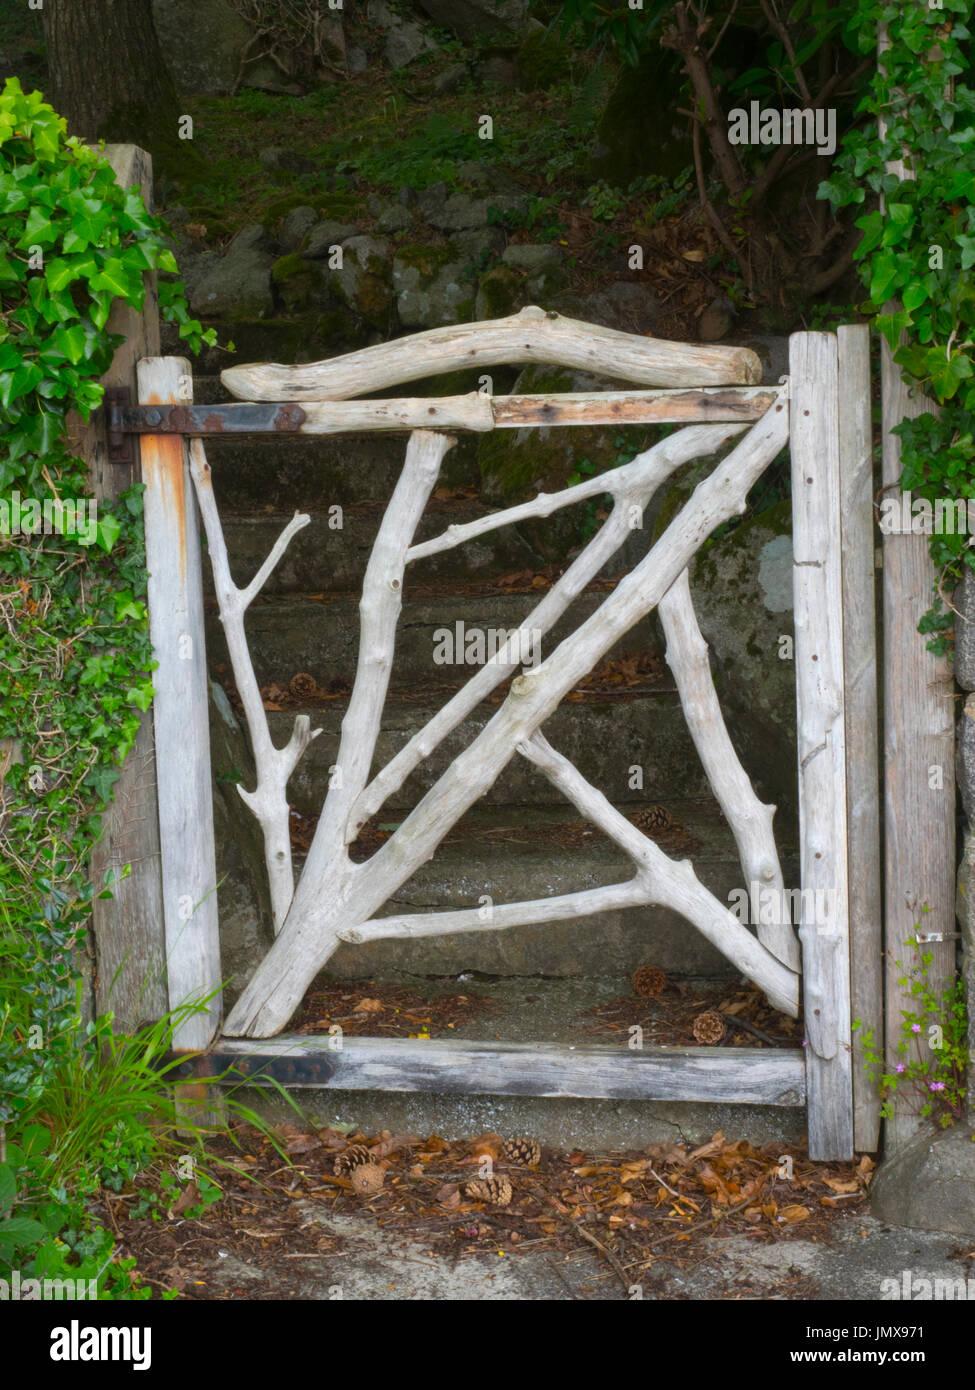 Rustic Garden Gate Made From Drift Wood In Coastal Garden